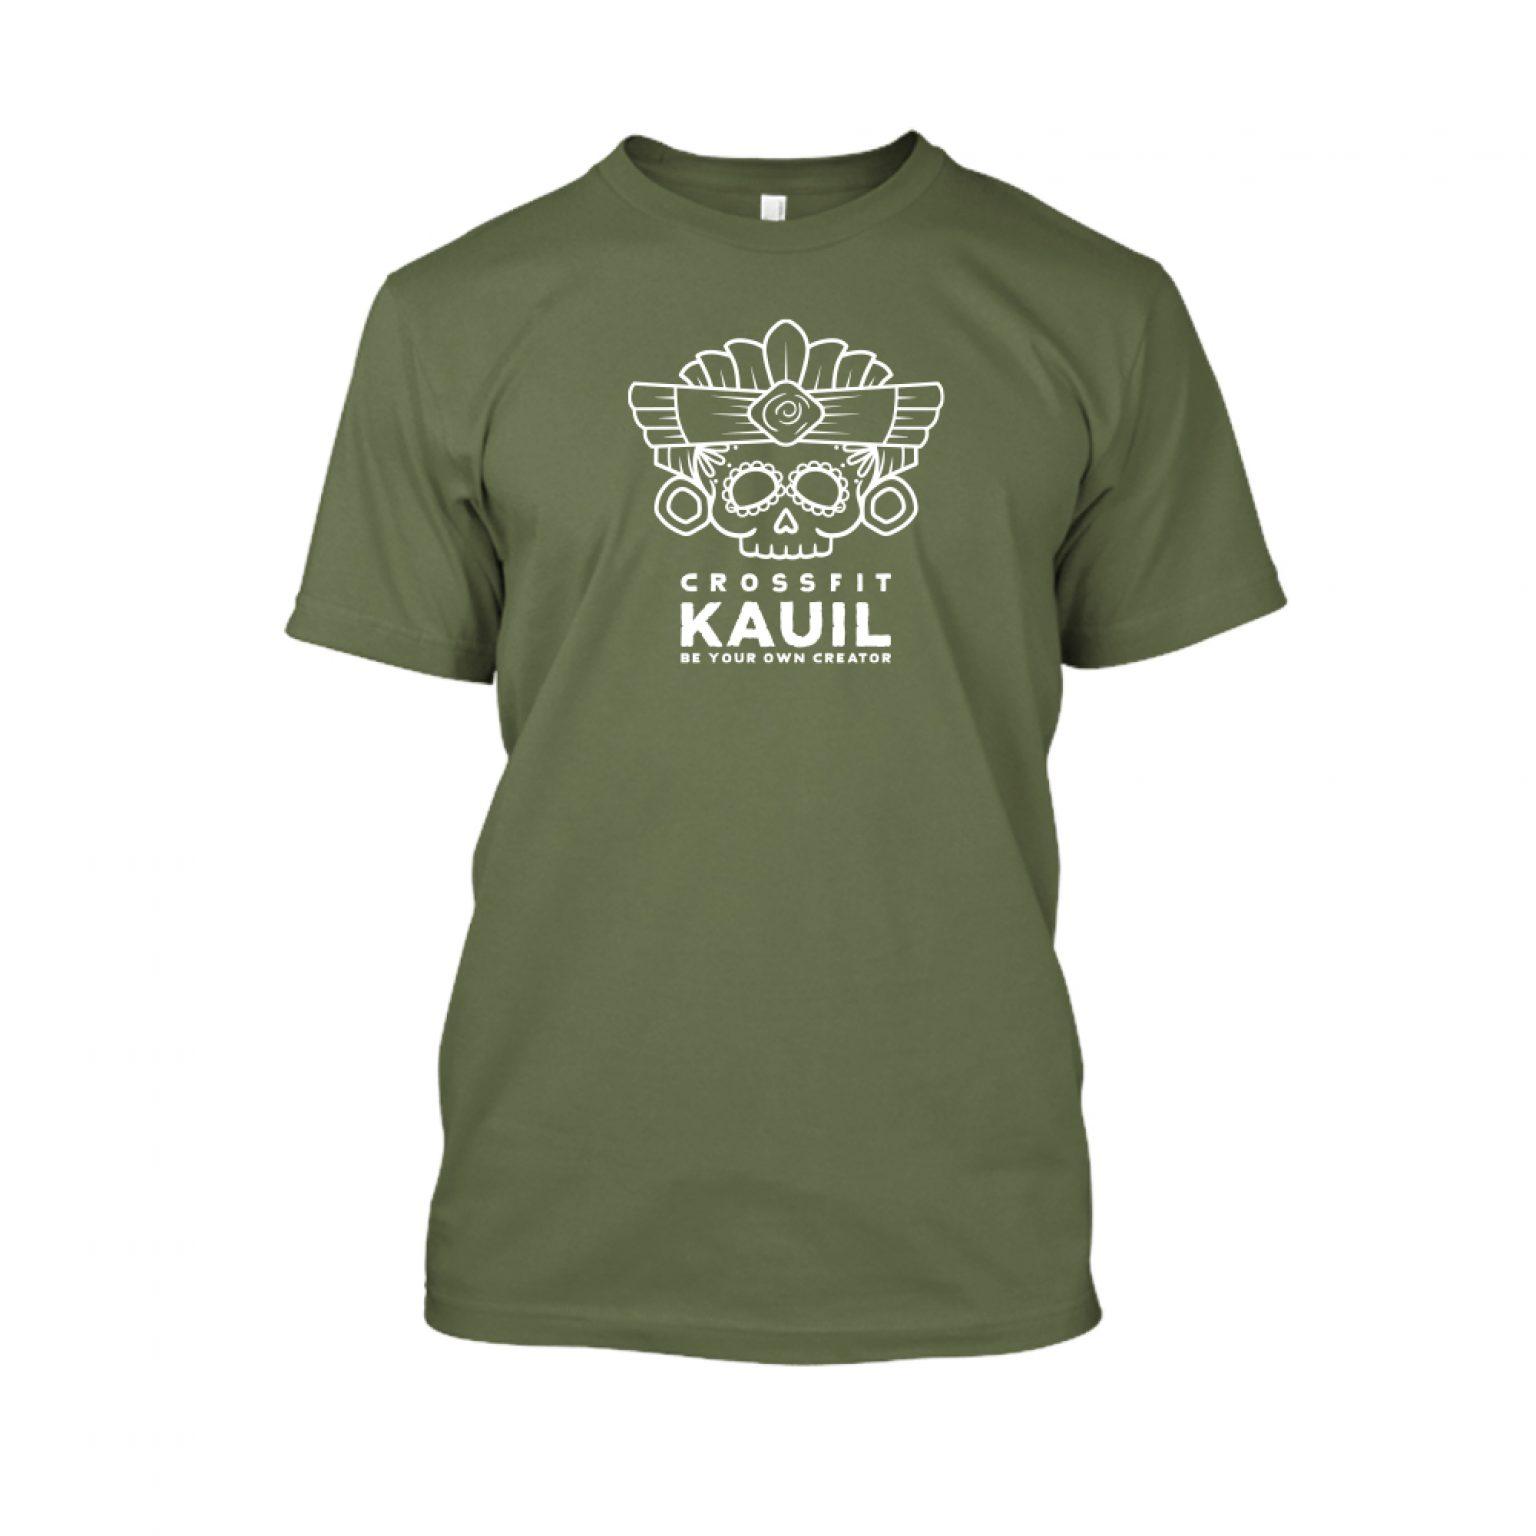 Herren Shirt Army1 weiss front